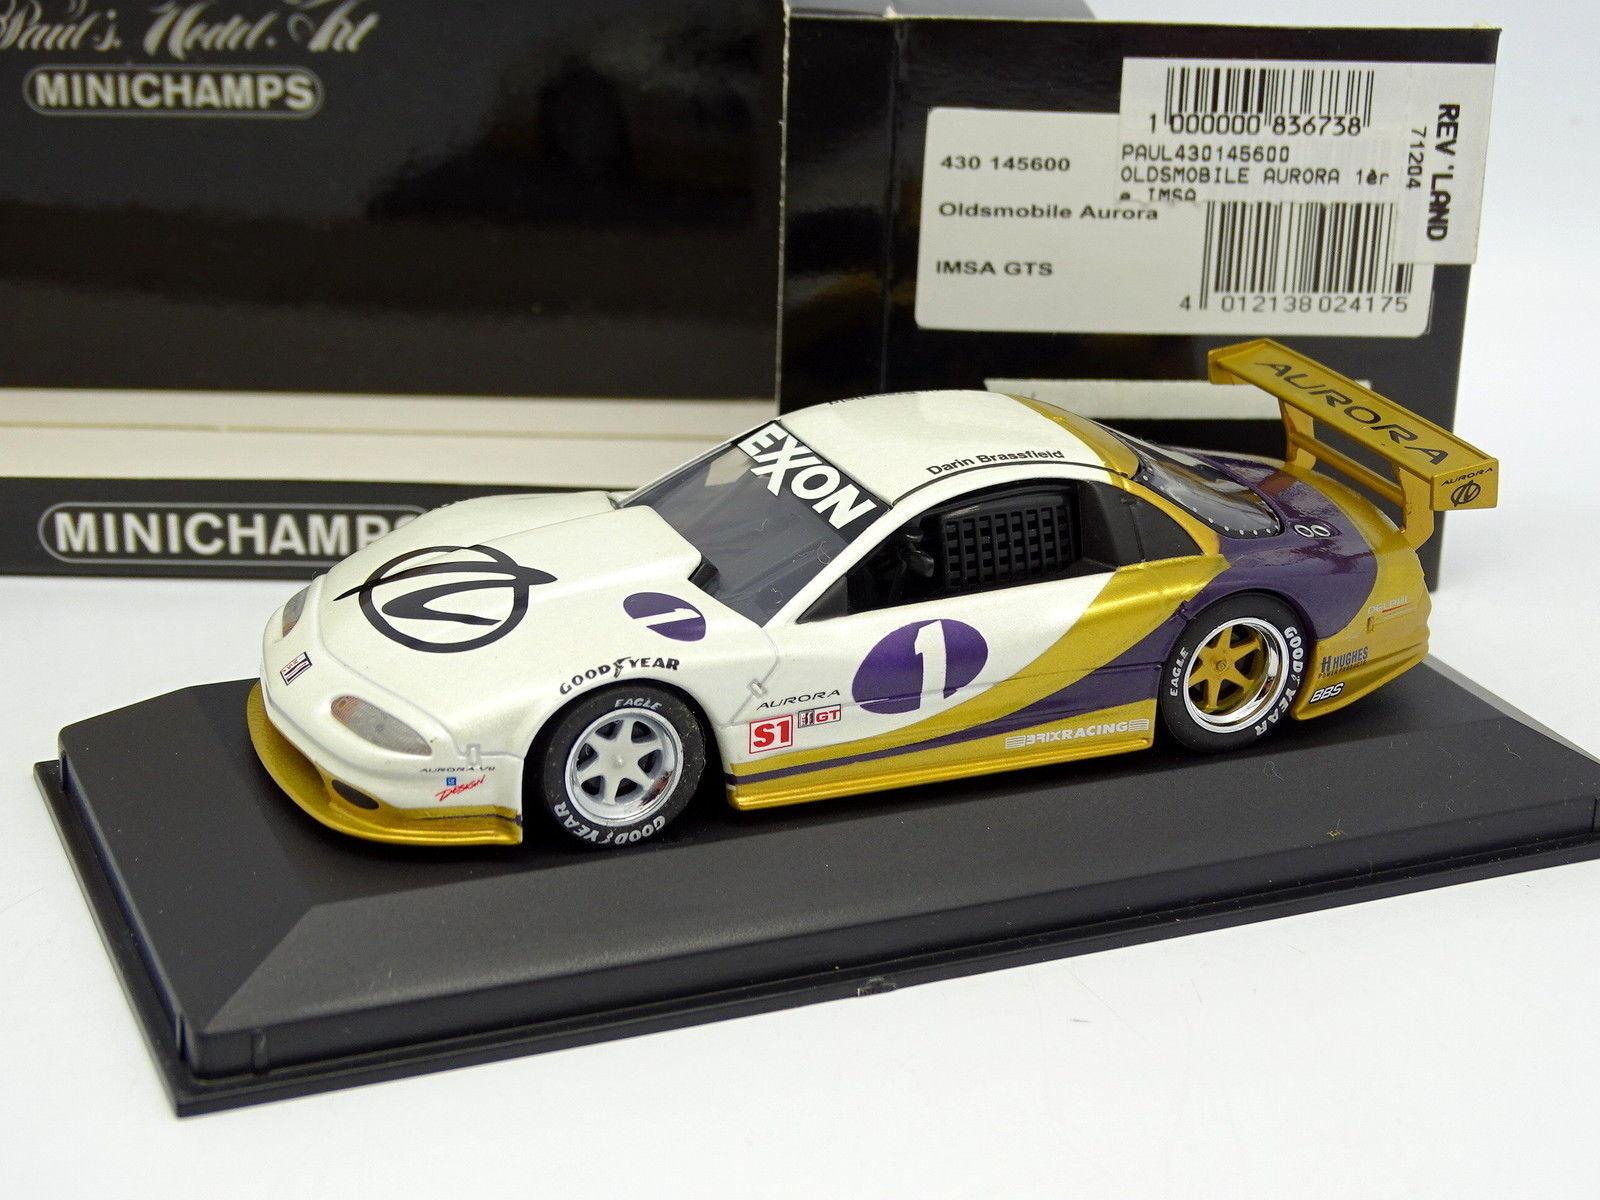 Minichamps 1 43 - Oldsmobile Aurora GTS N° 1 Daytona 1996